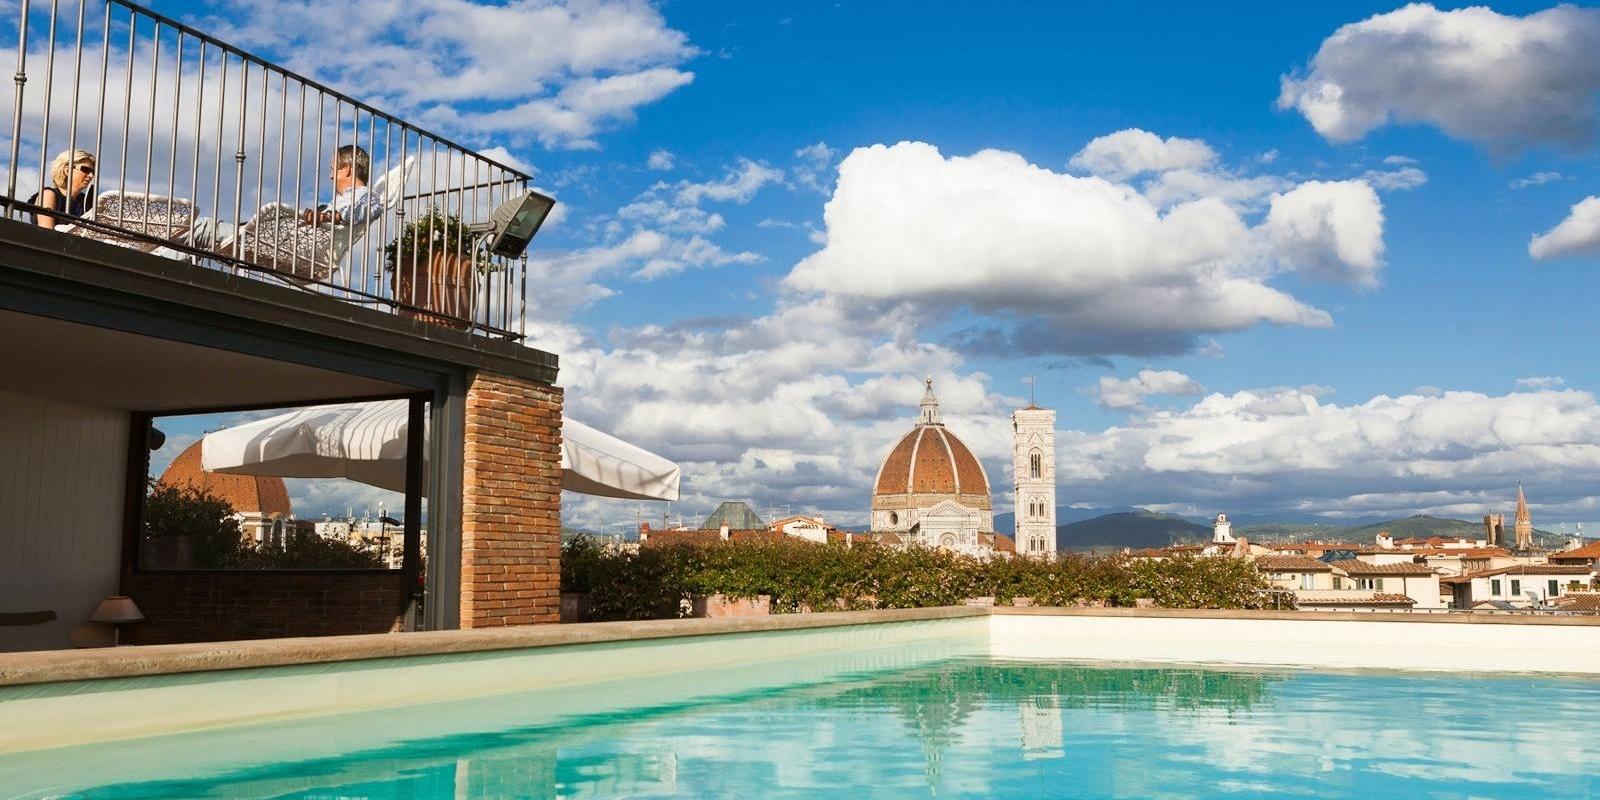 più belle terrazze di Firenze per un aperitivo con vista panoramica